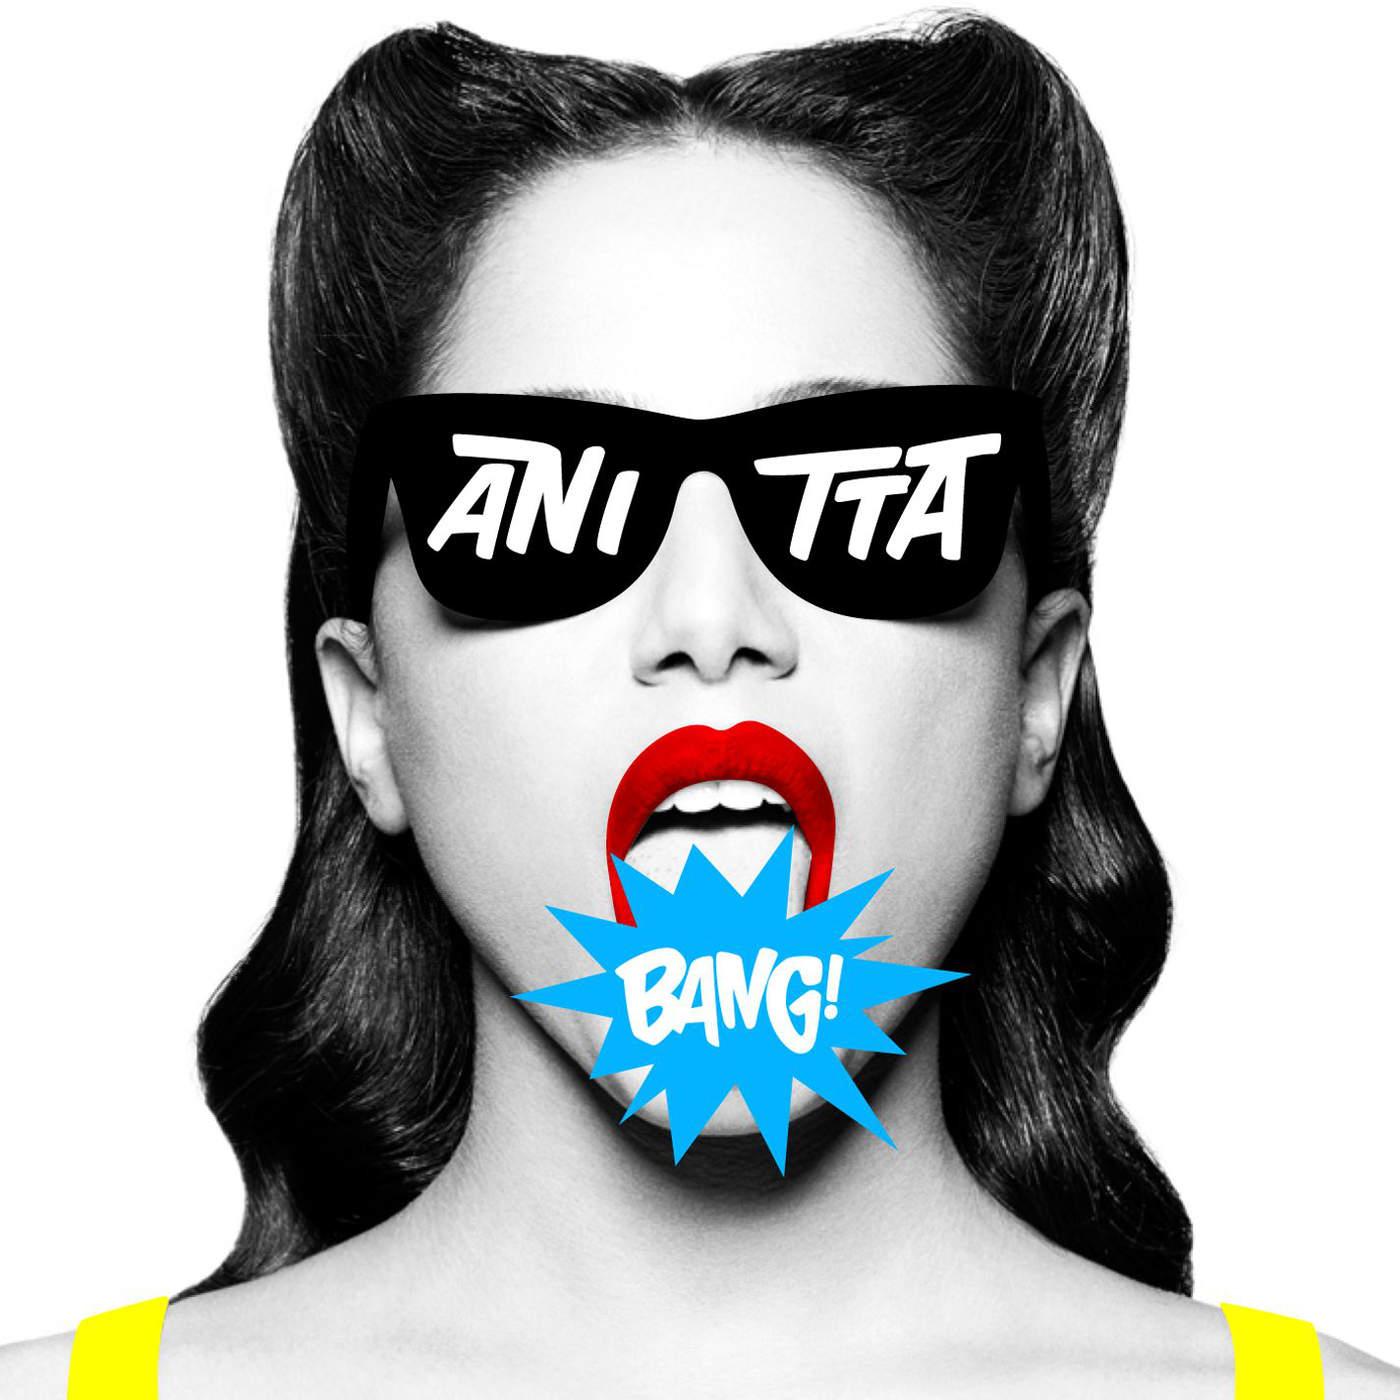 Baixar Anitta - BANG Grátis MP3